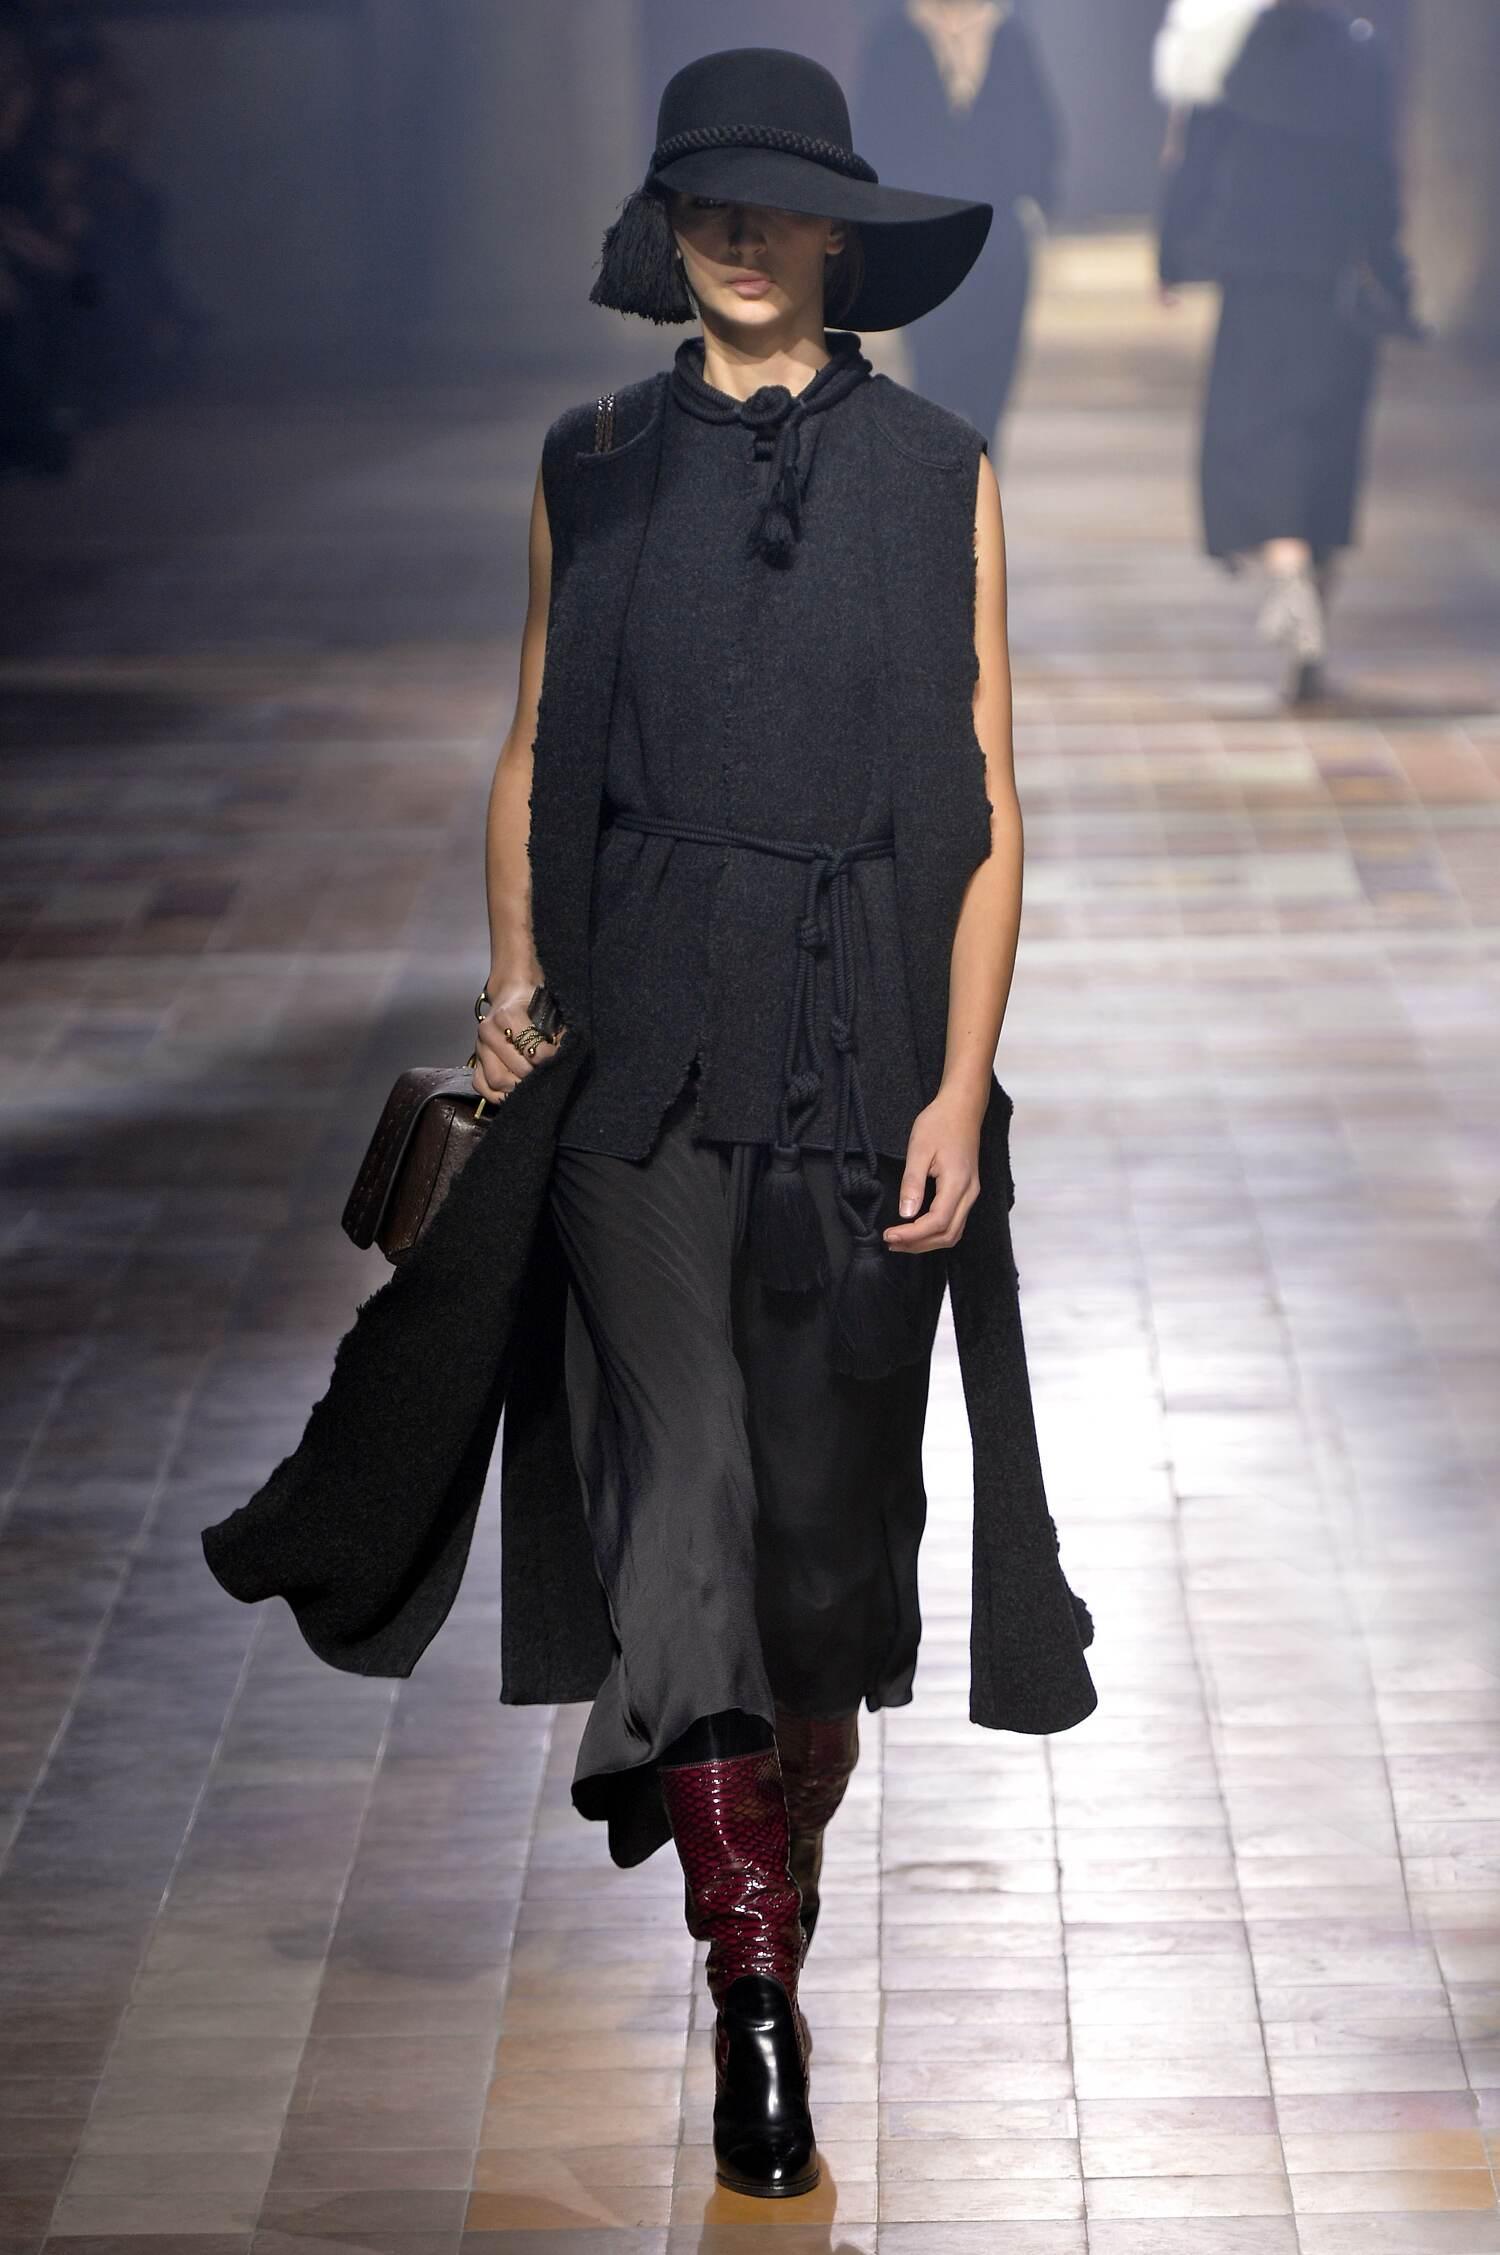 Lanvin Fall Winter 2015 16 Womens Collection Paris Fashion Week